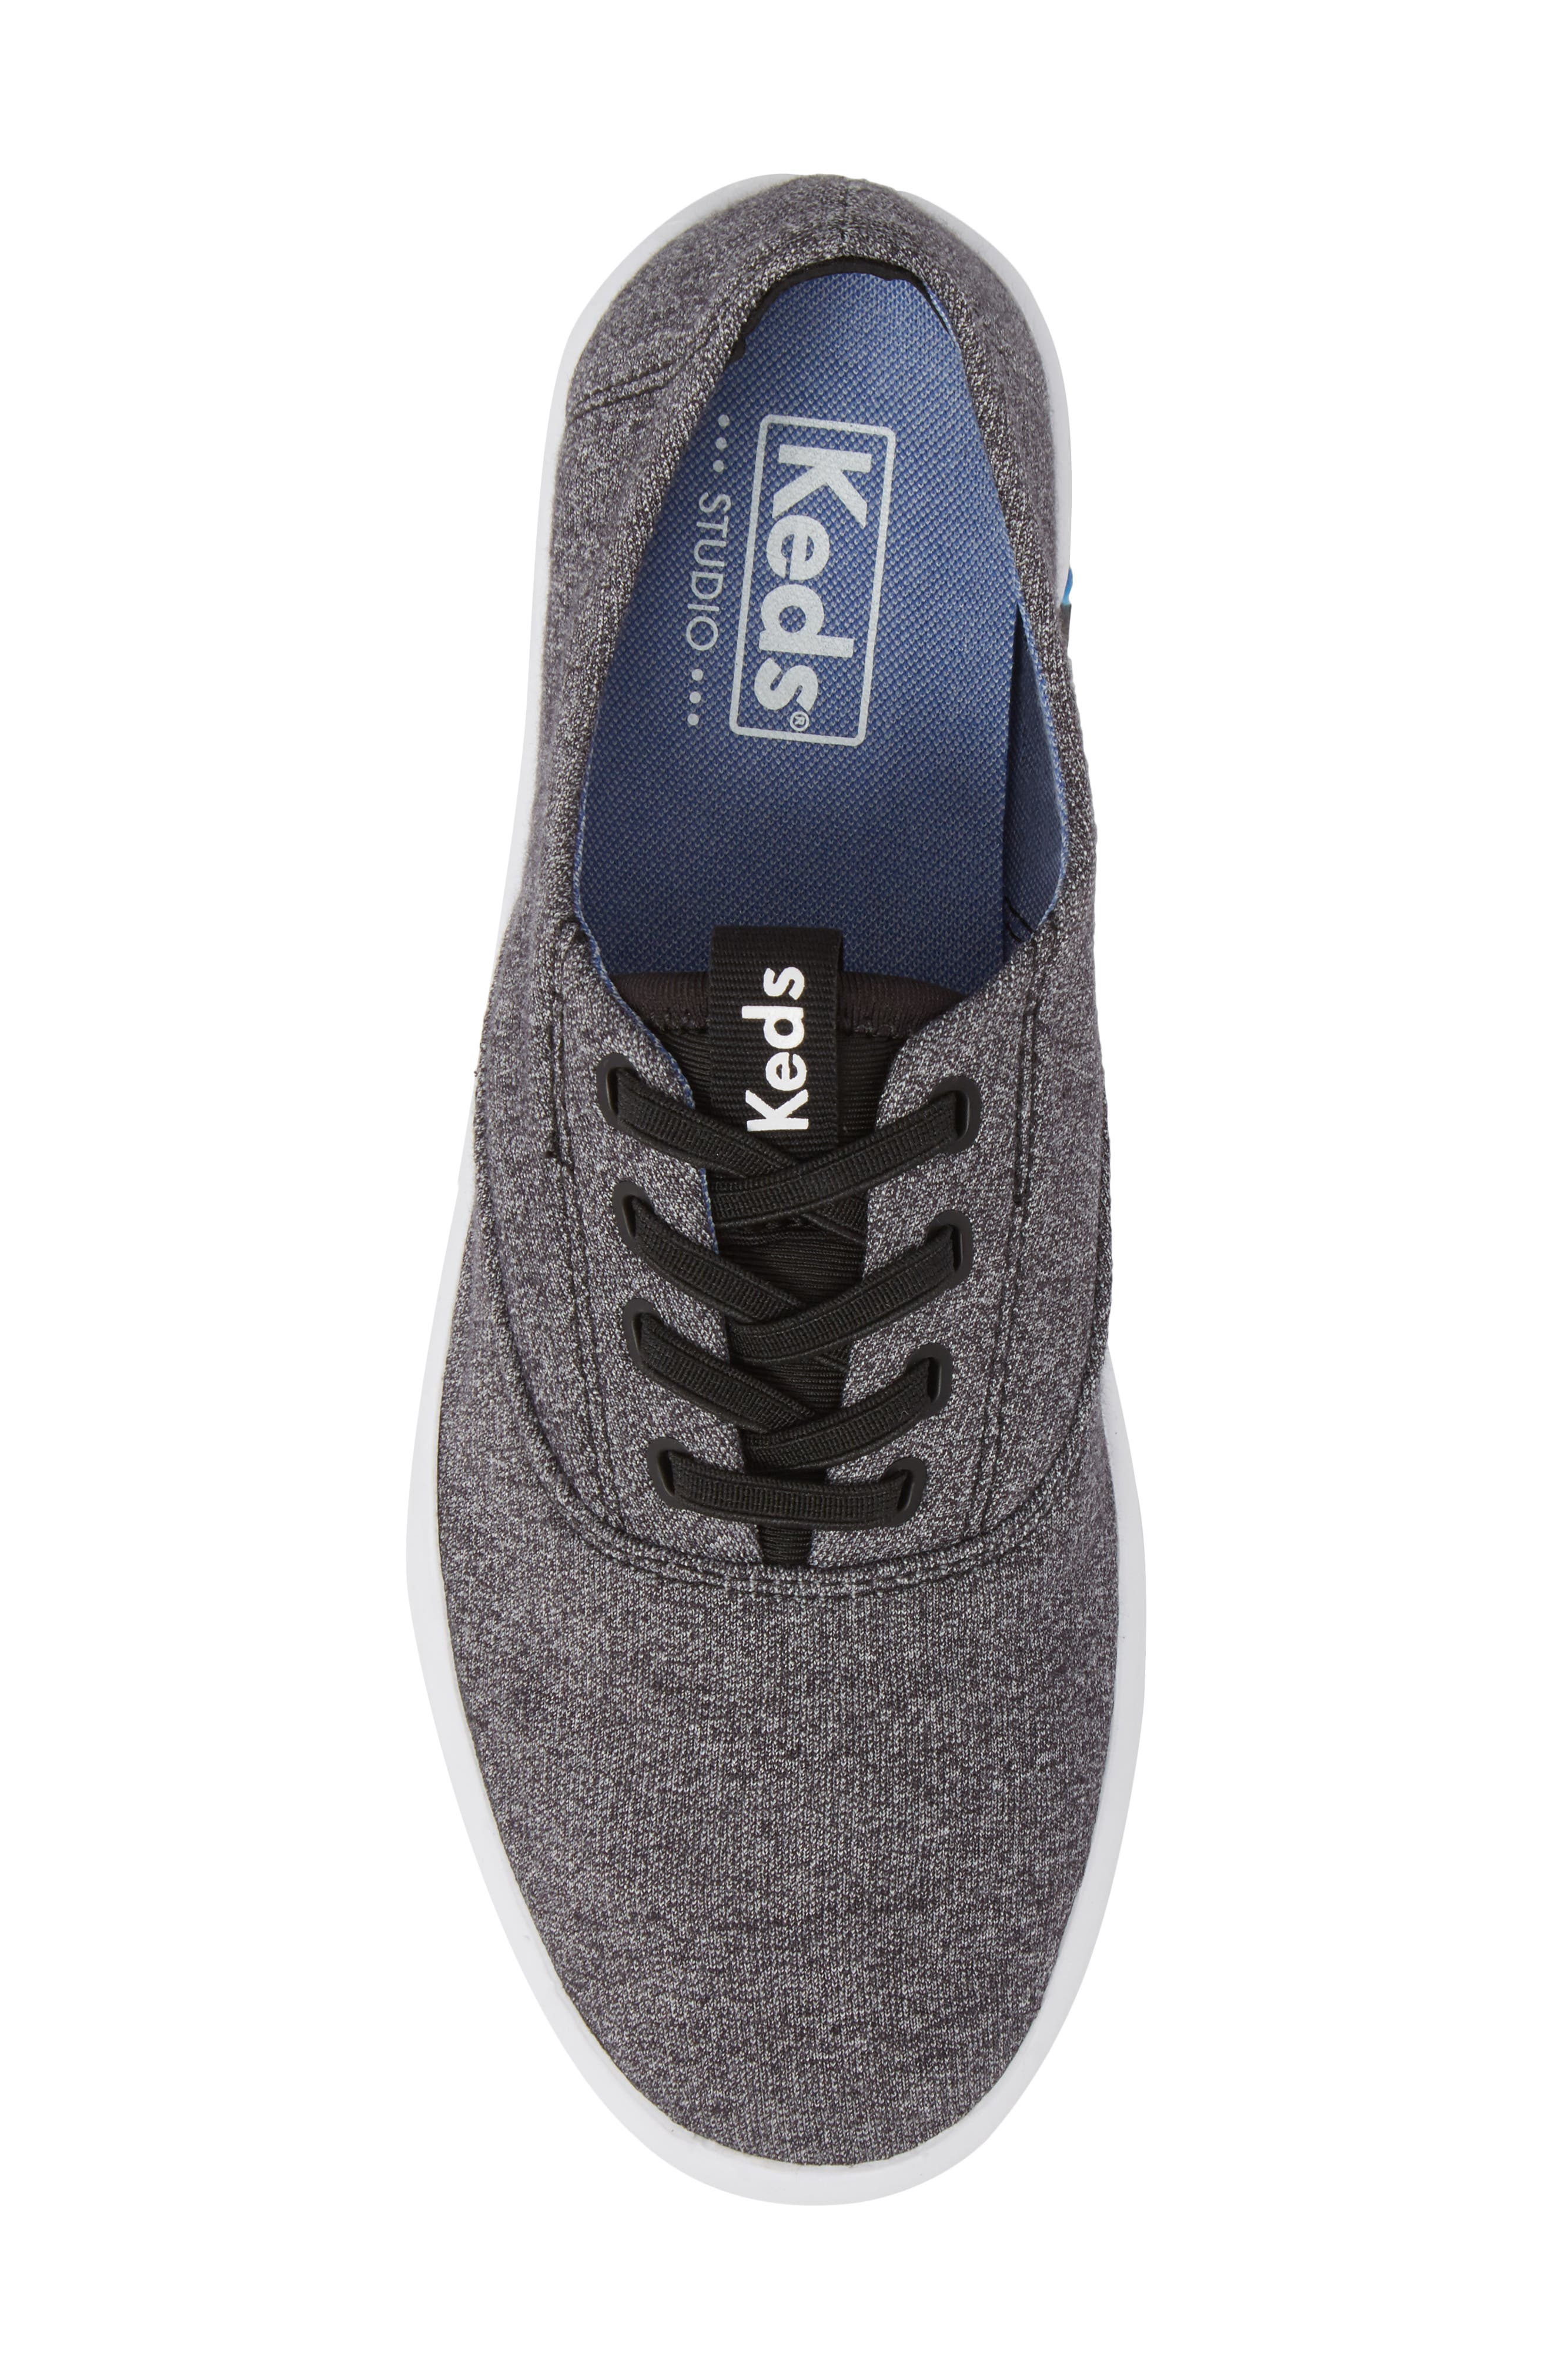 Studio Leap Sneaker,                             Alternate thumbnail 5, color,                             Charcoal